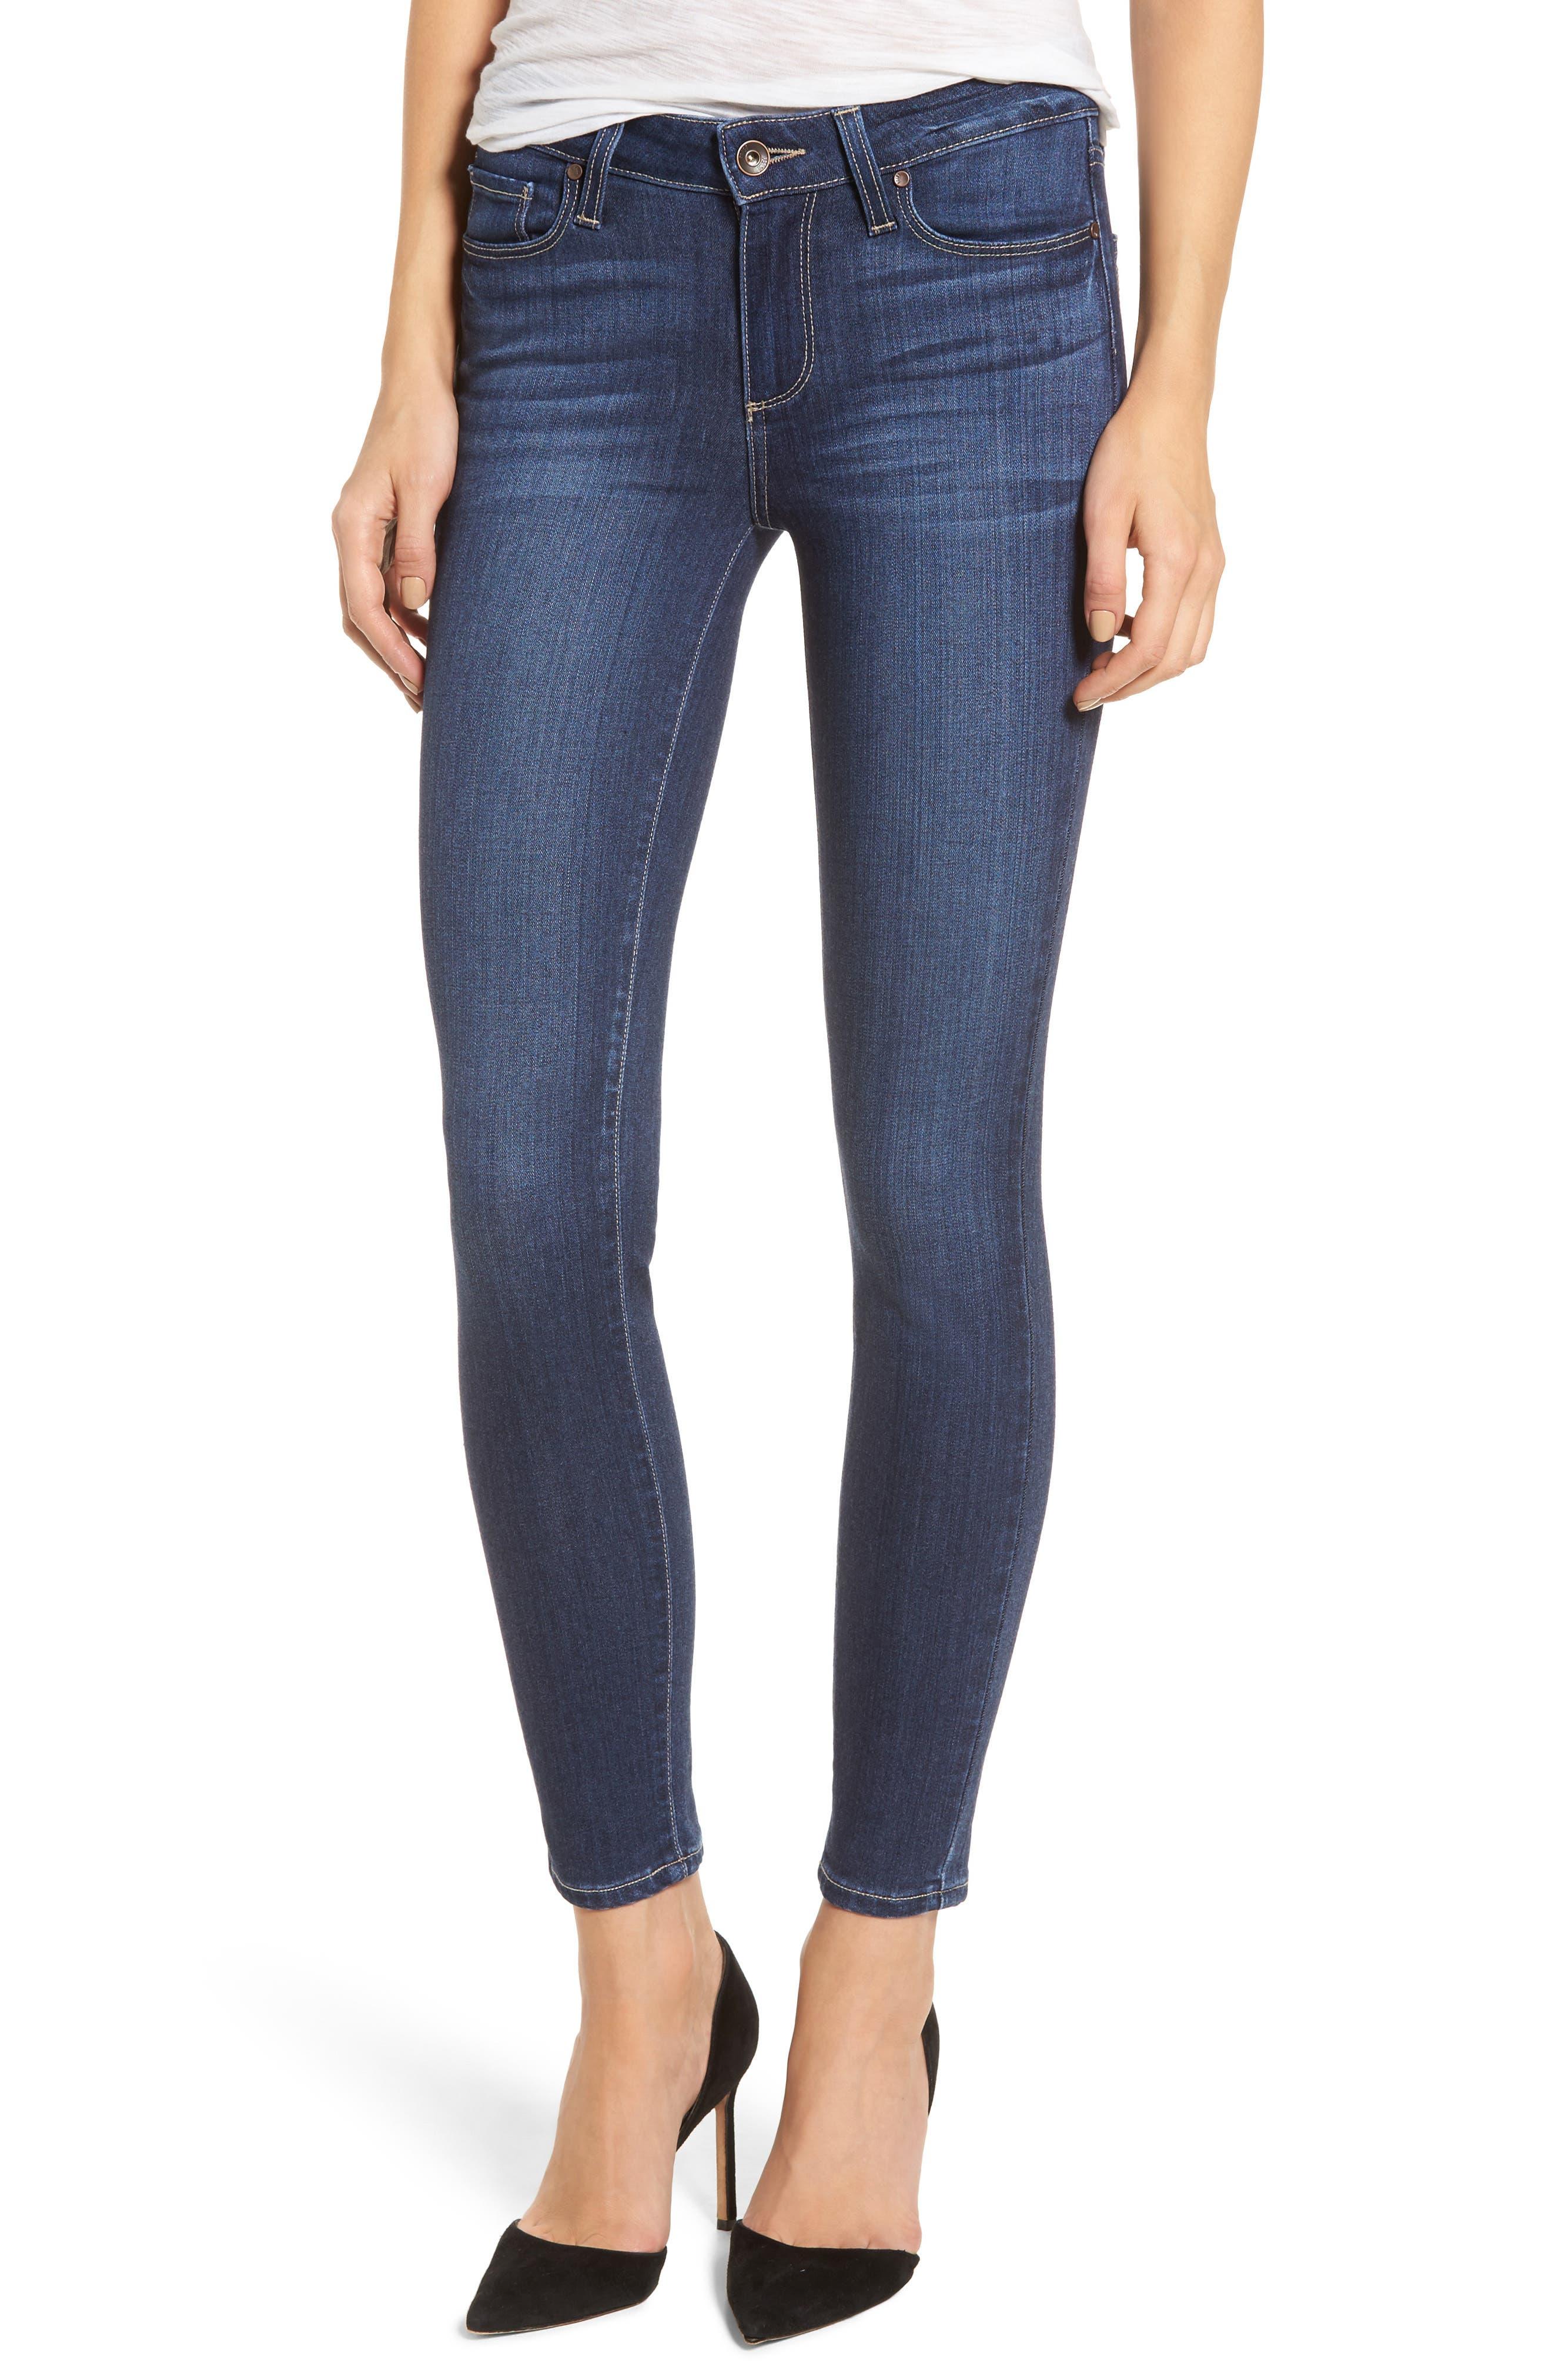 Transcend - Verdugo Ankle Skinny Jeans,                         Main,                         color, Blue